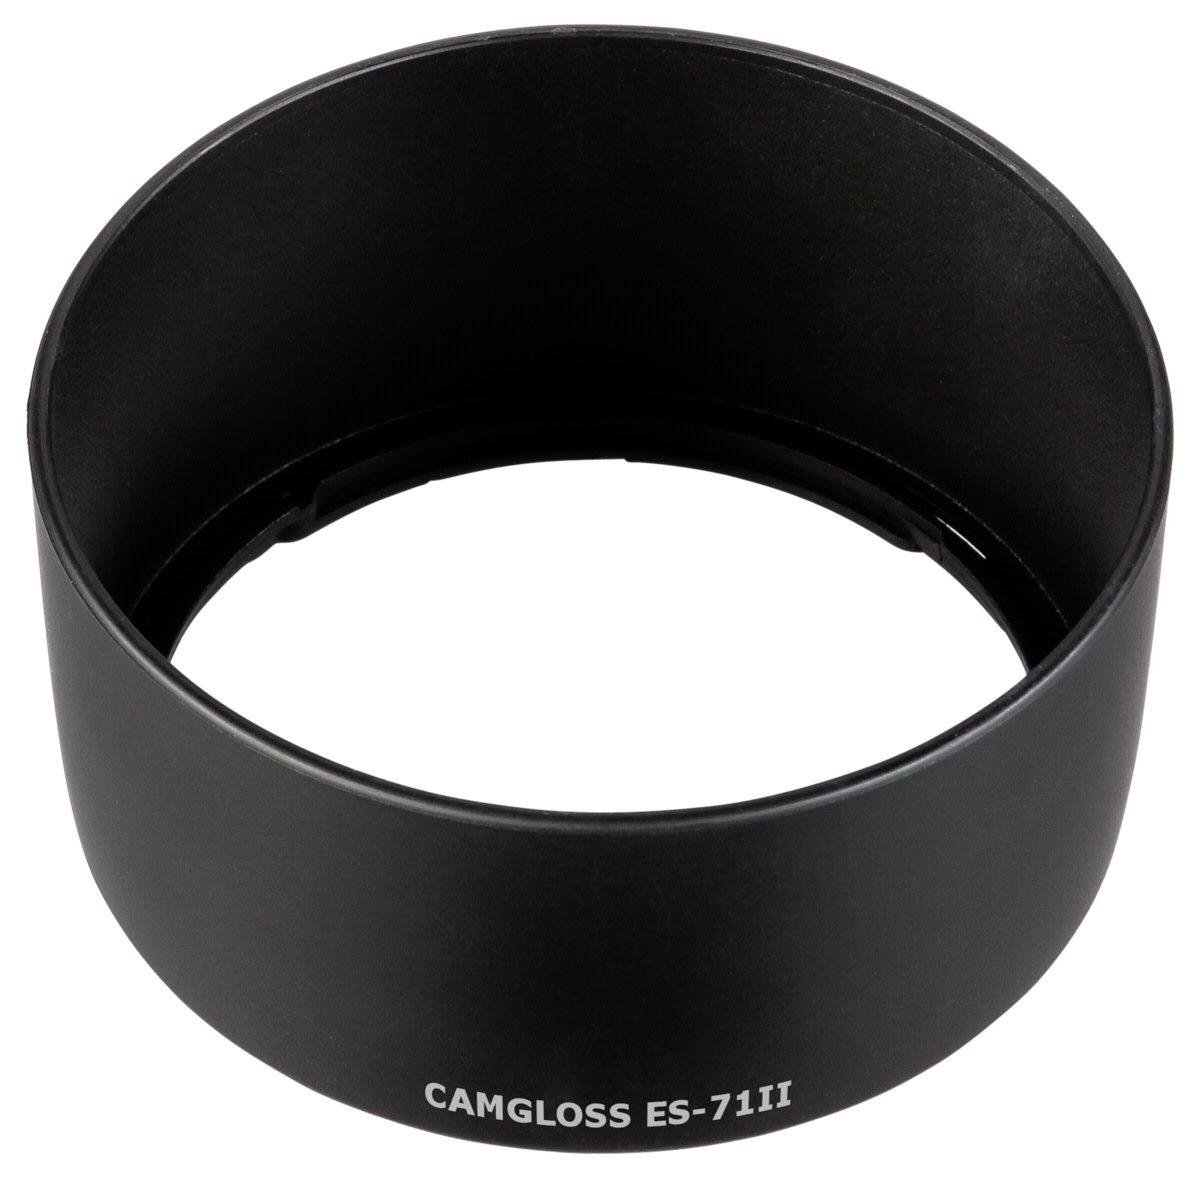 Camgloss Foto Equipment »ES-71 II Blende für Canon«